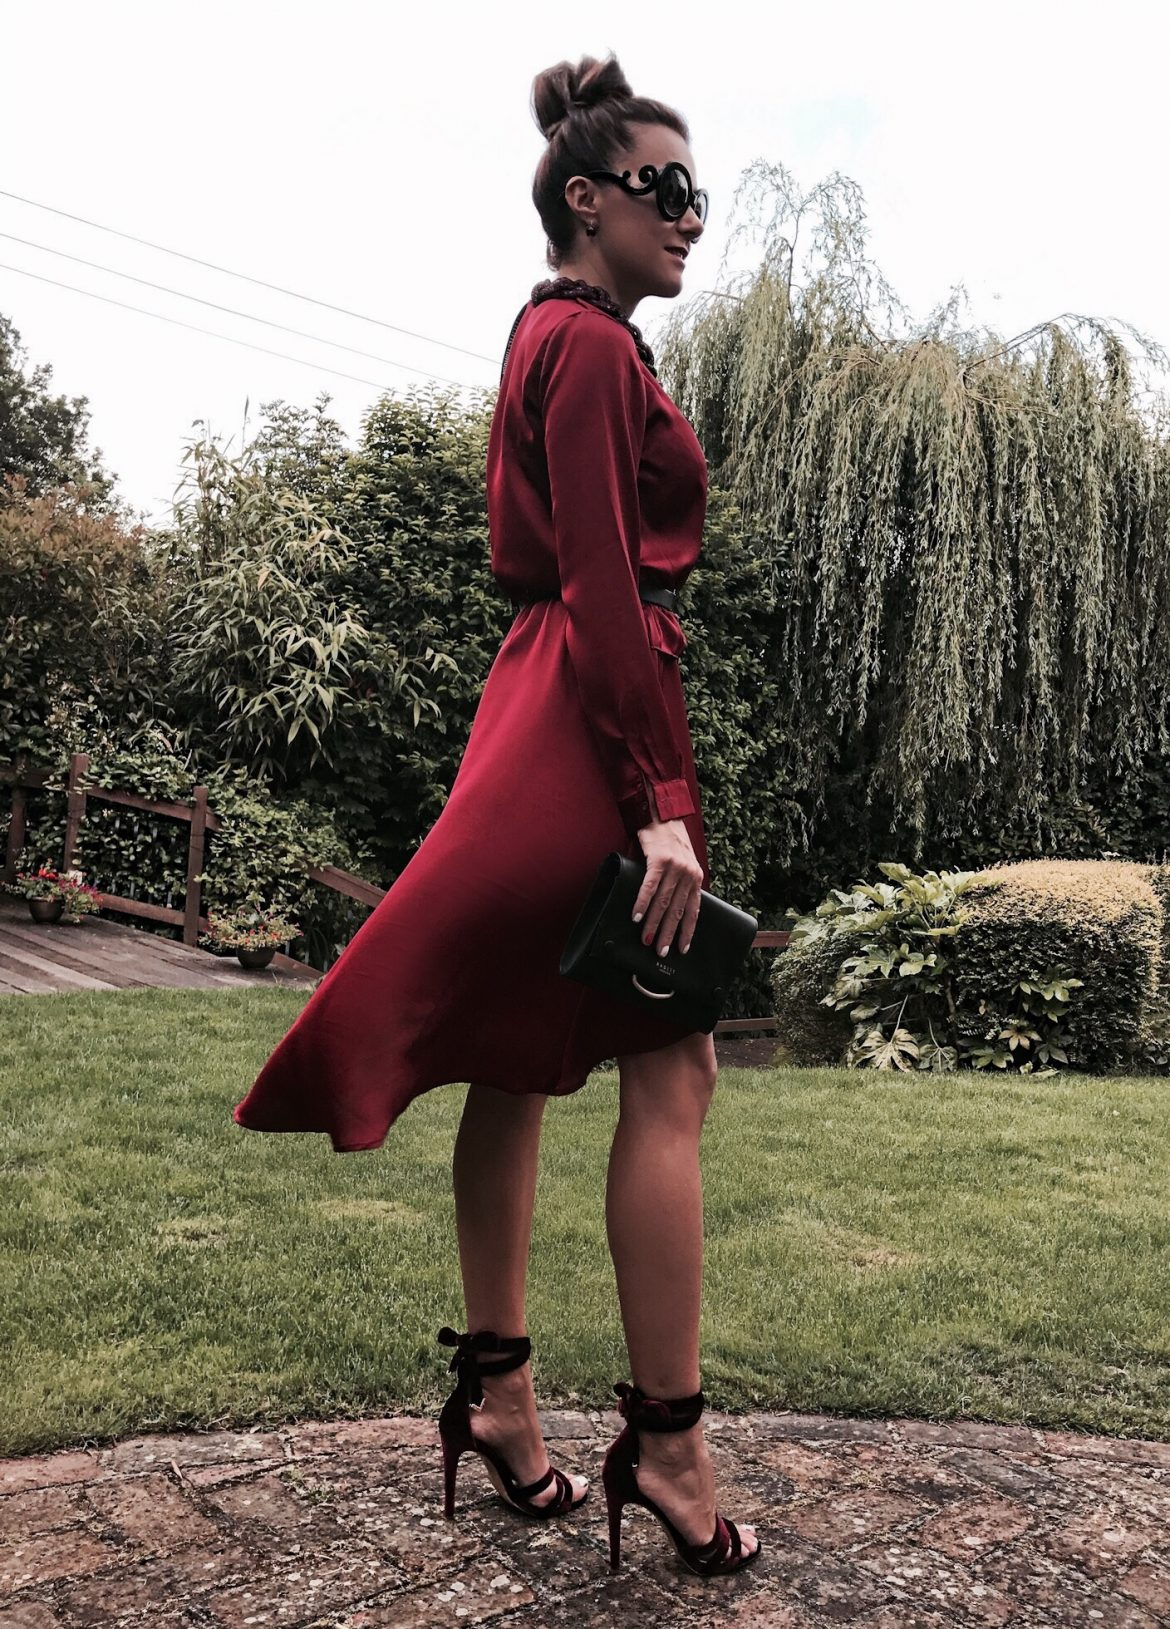 Radley, necklace, heeled sandals, black clutch, satin dress, burgundy dress, Prada sunglasses